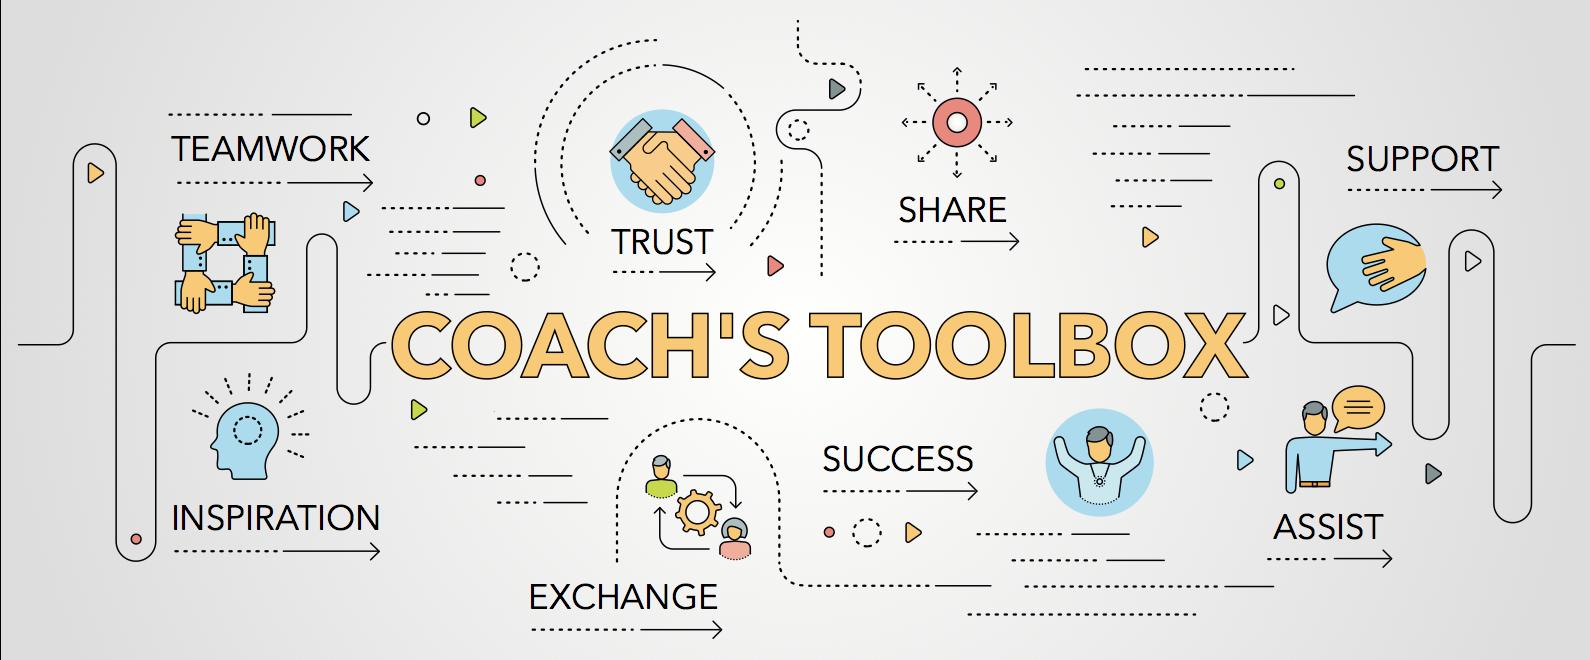 blog.teachboost.comhubfsHeadersCollaboration Montage-41